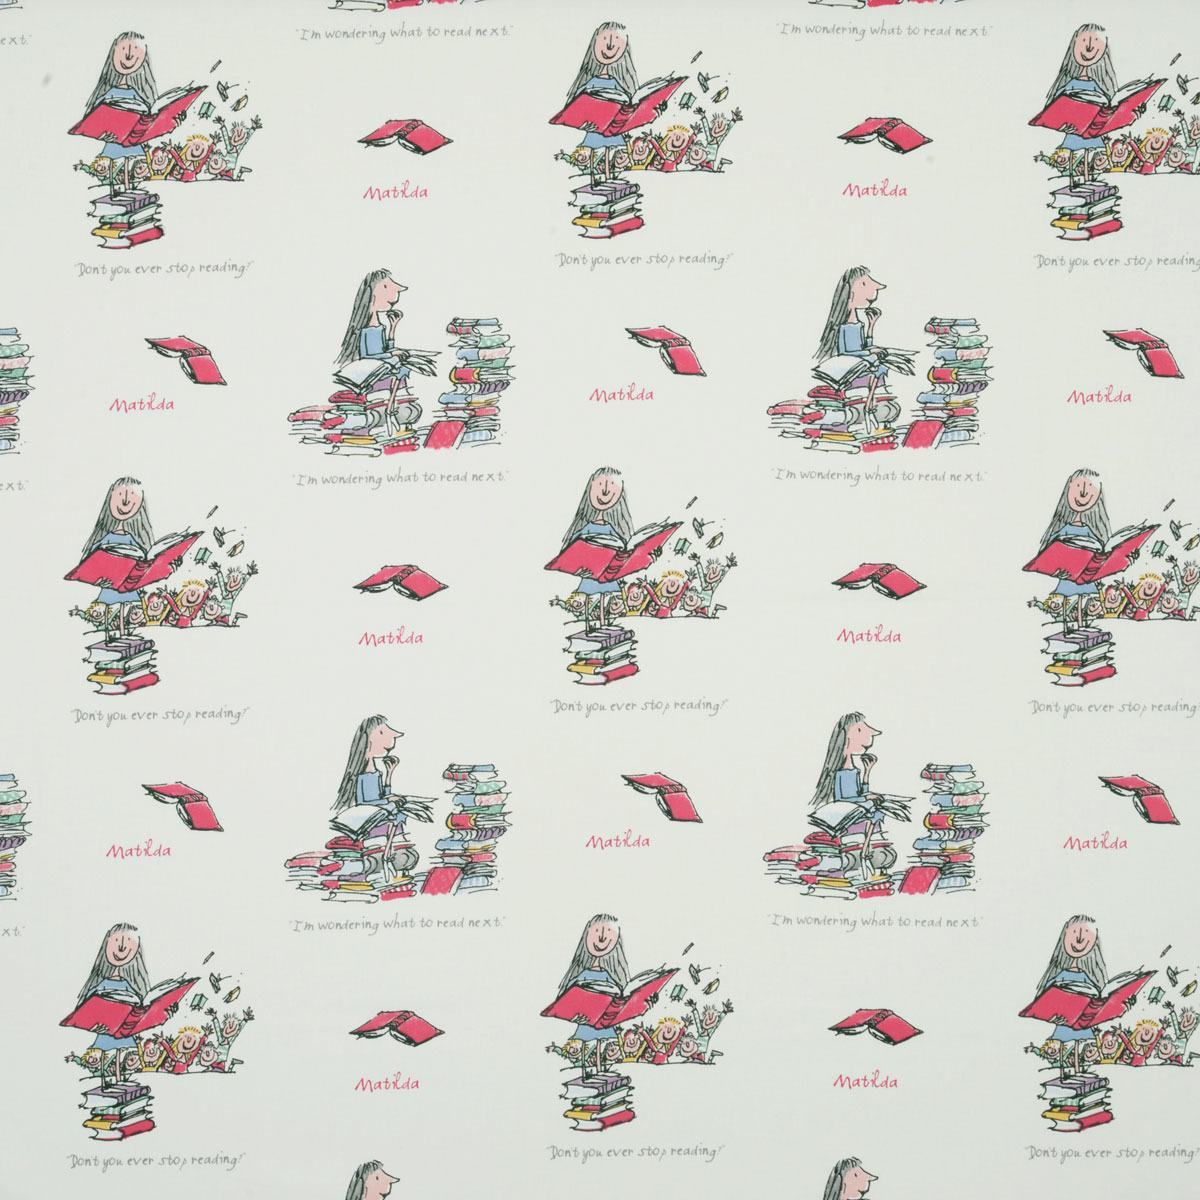 Roald Dahl Matilda Curtain Fabric | Free UK Delivery | Terrys Fabrics